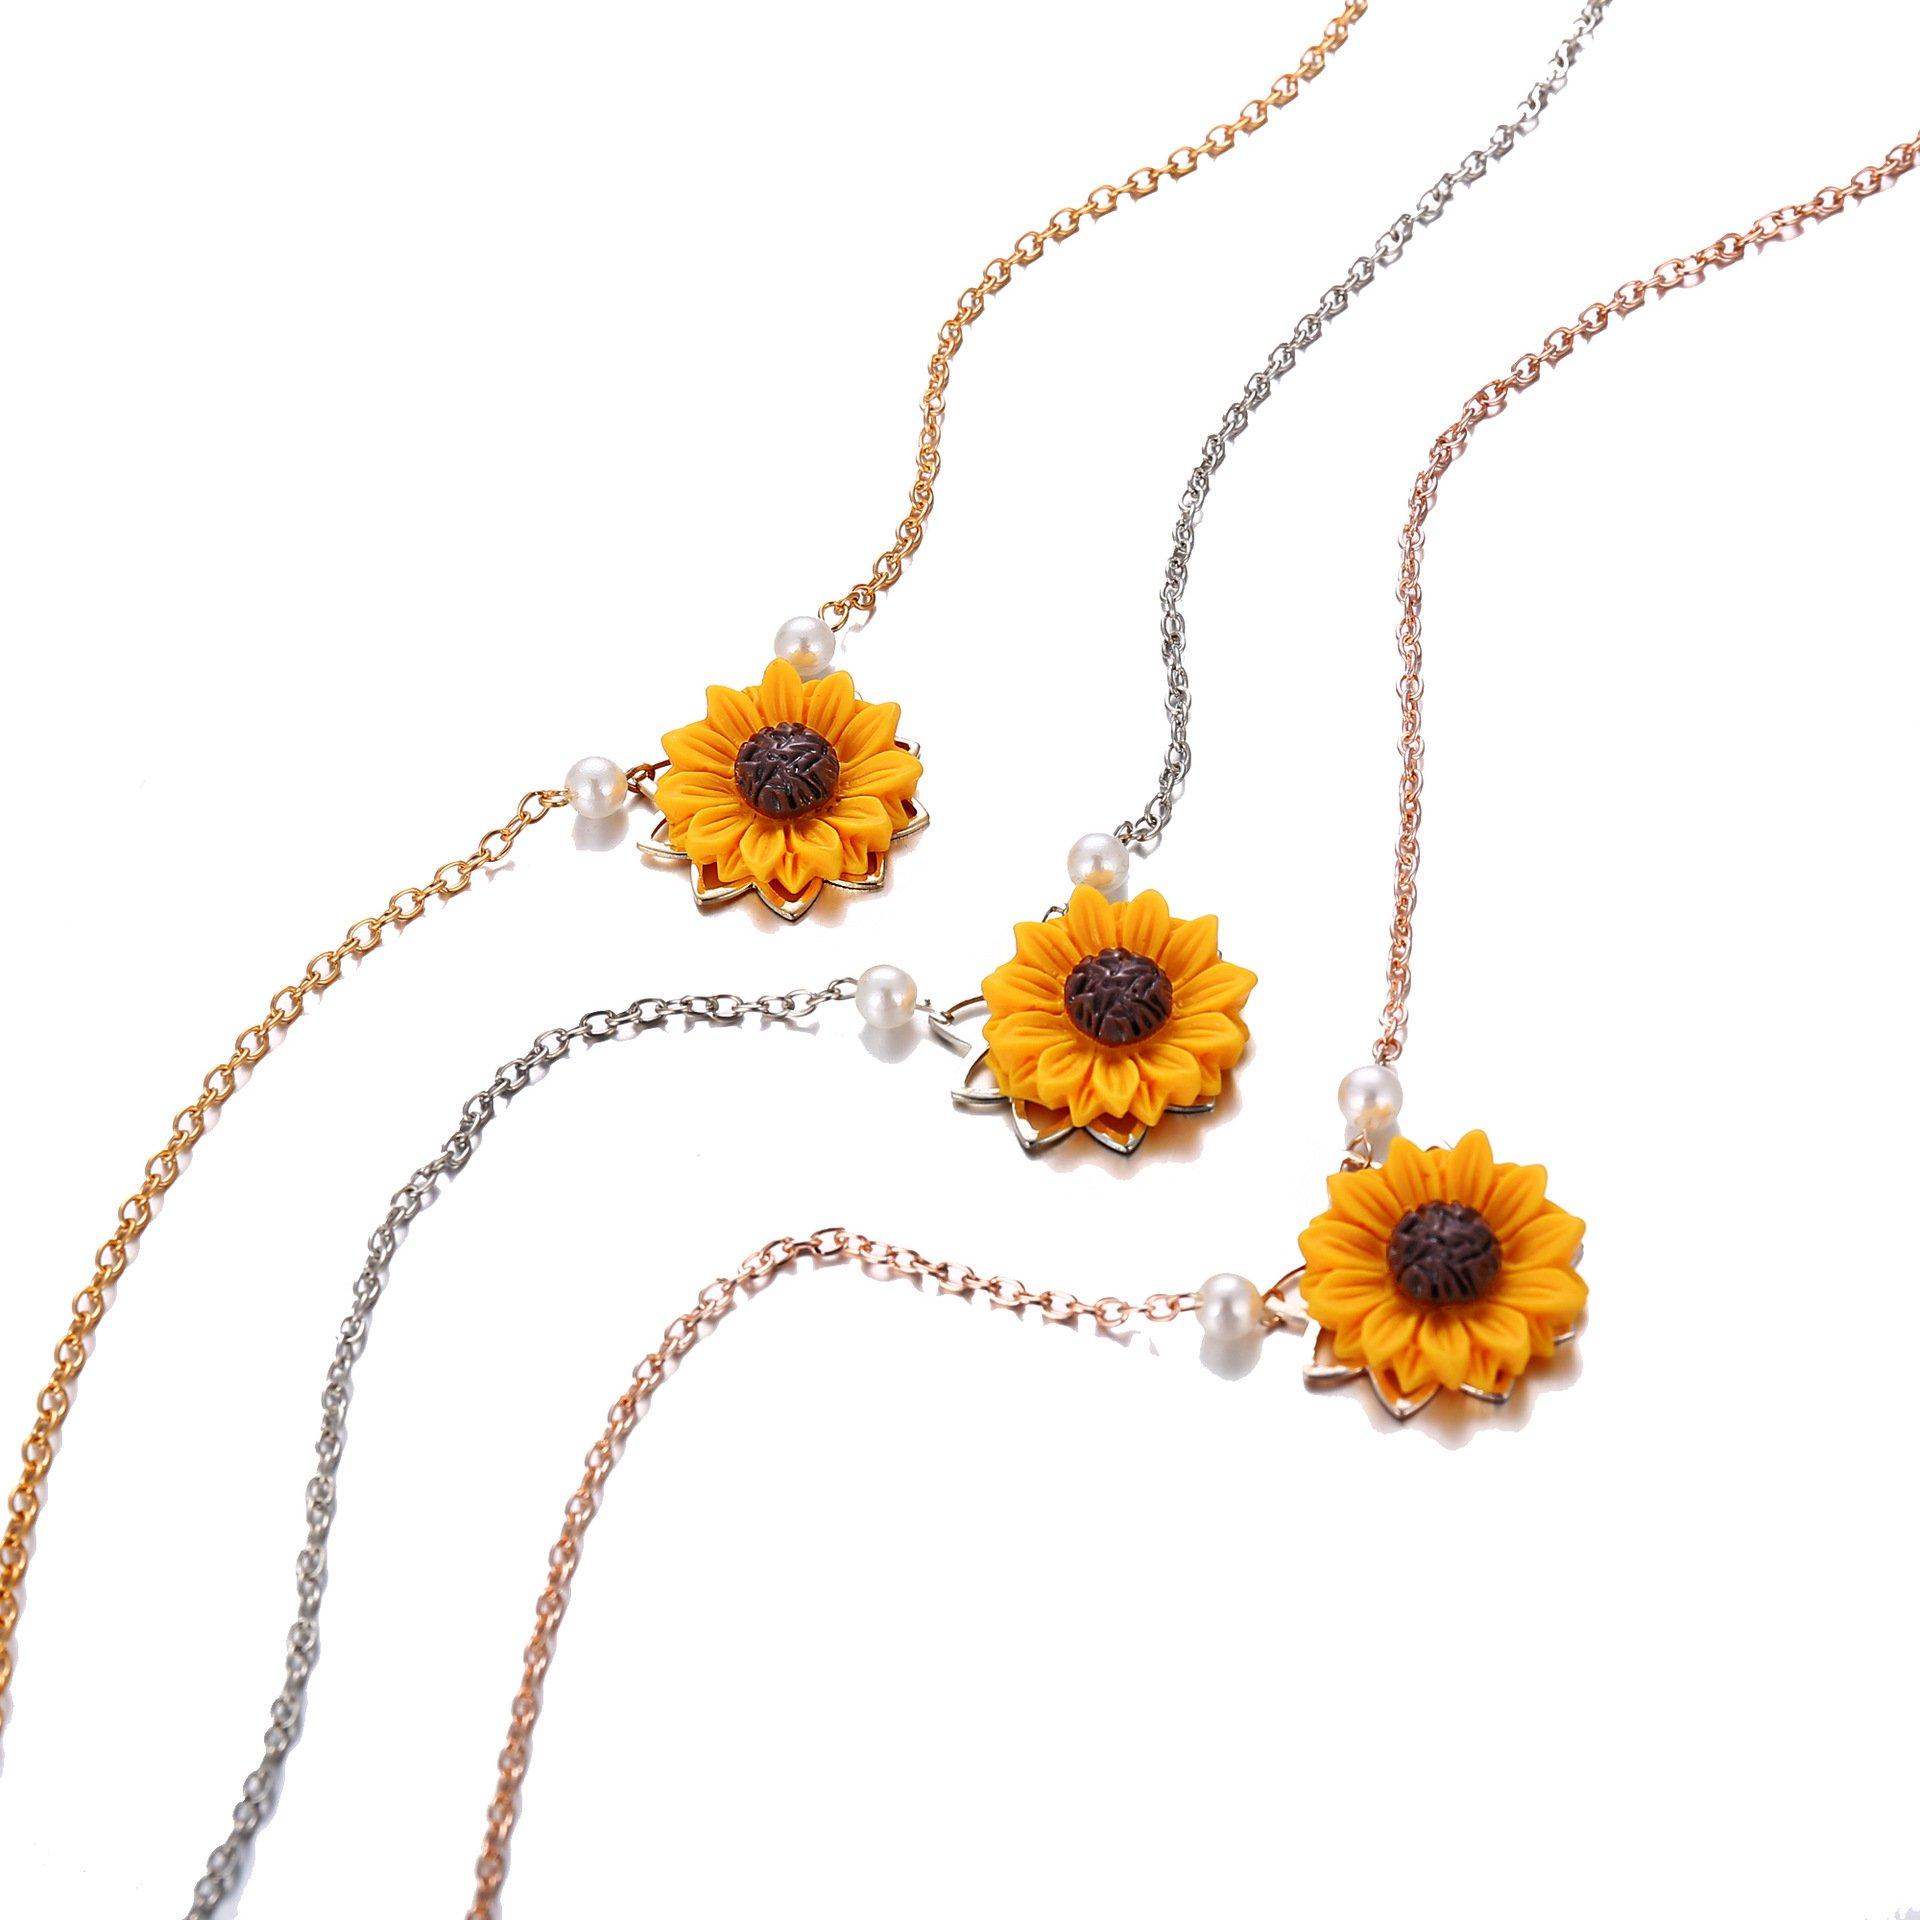 Full Bloom Sunflower Necklace